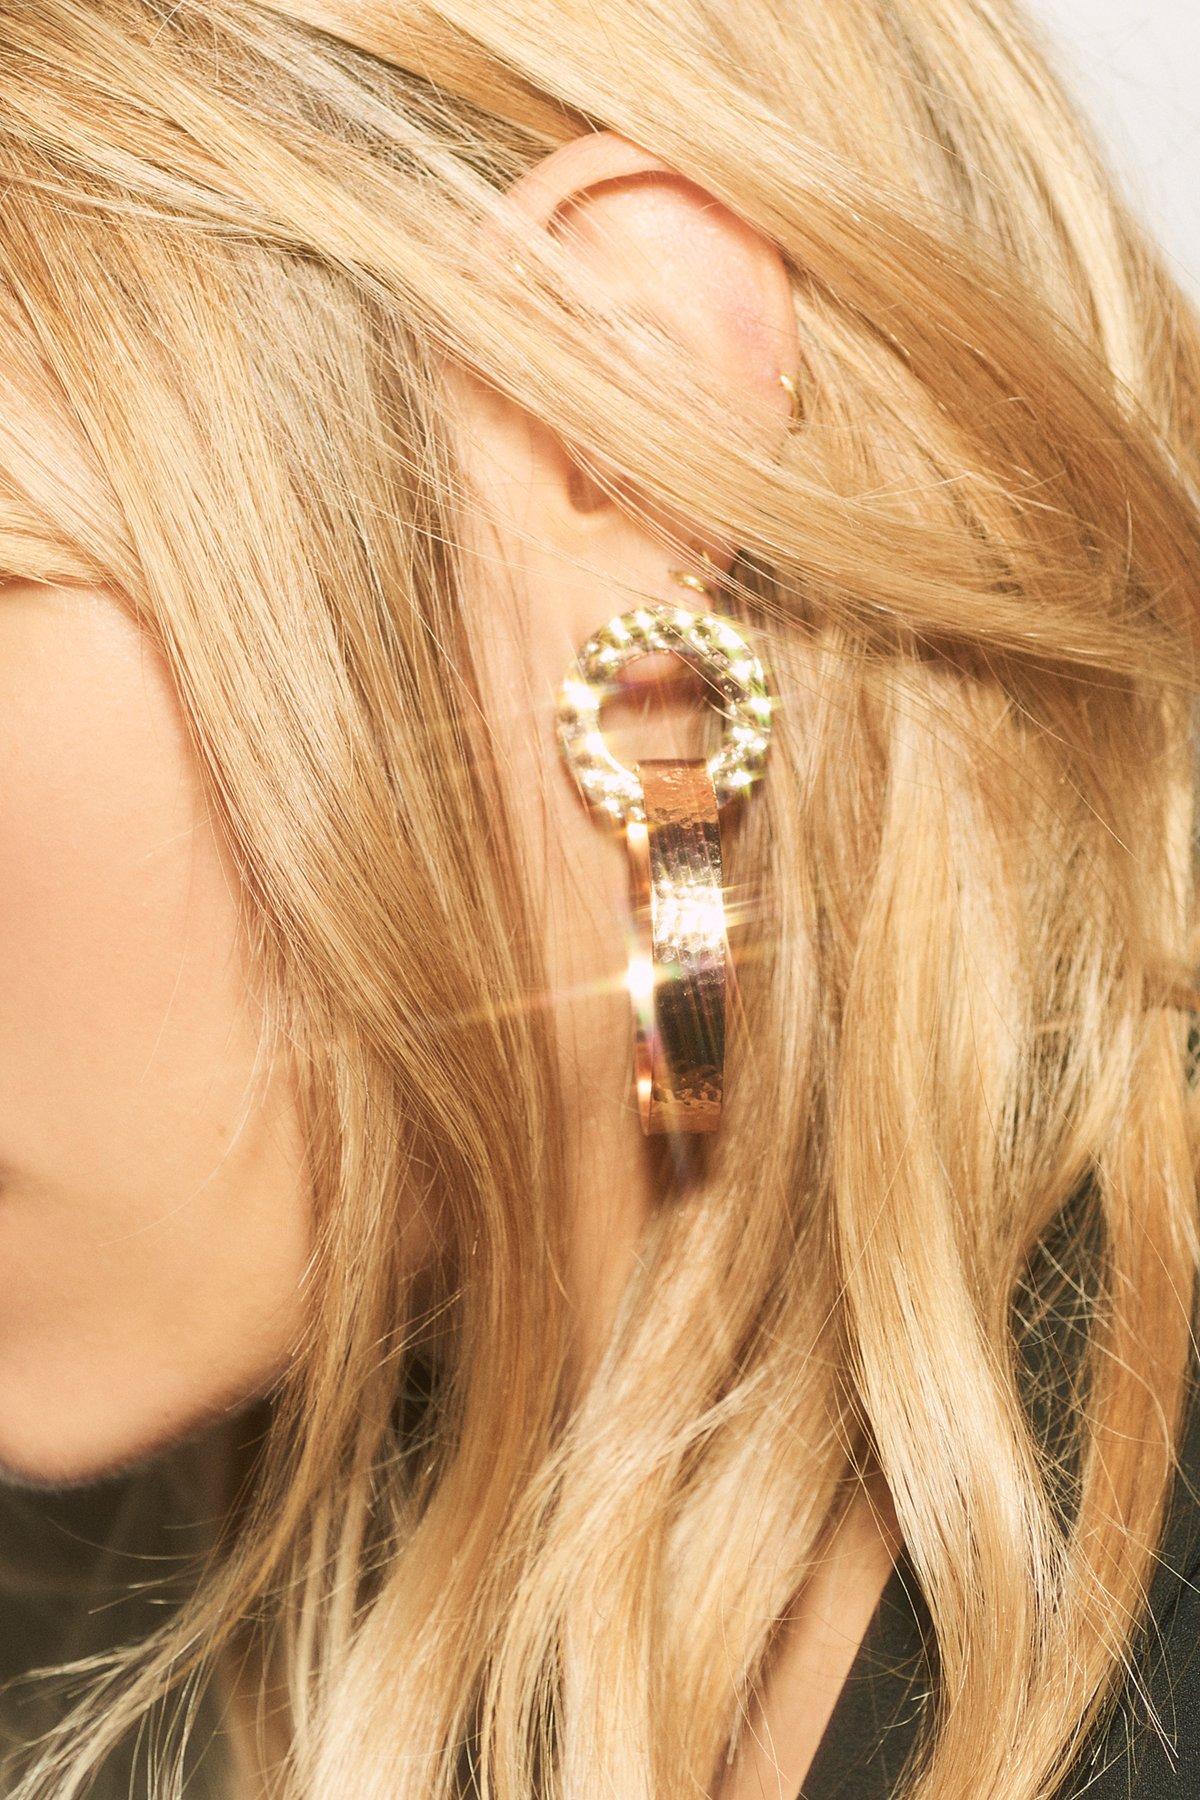 Lizzie双环耳圈